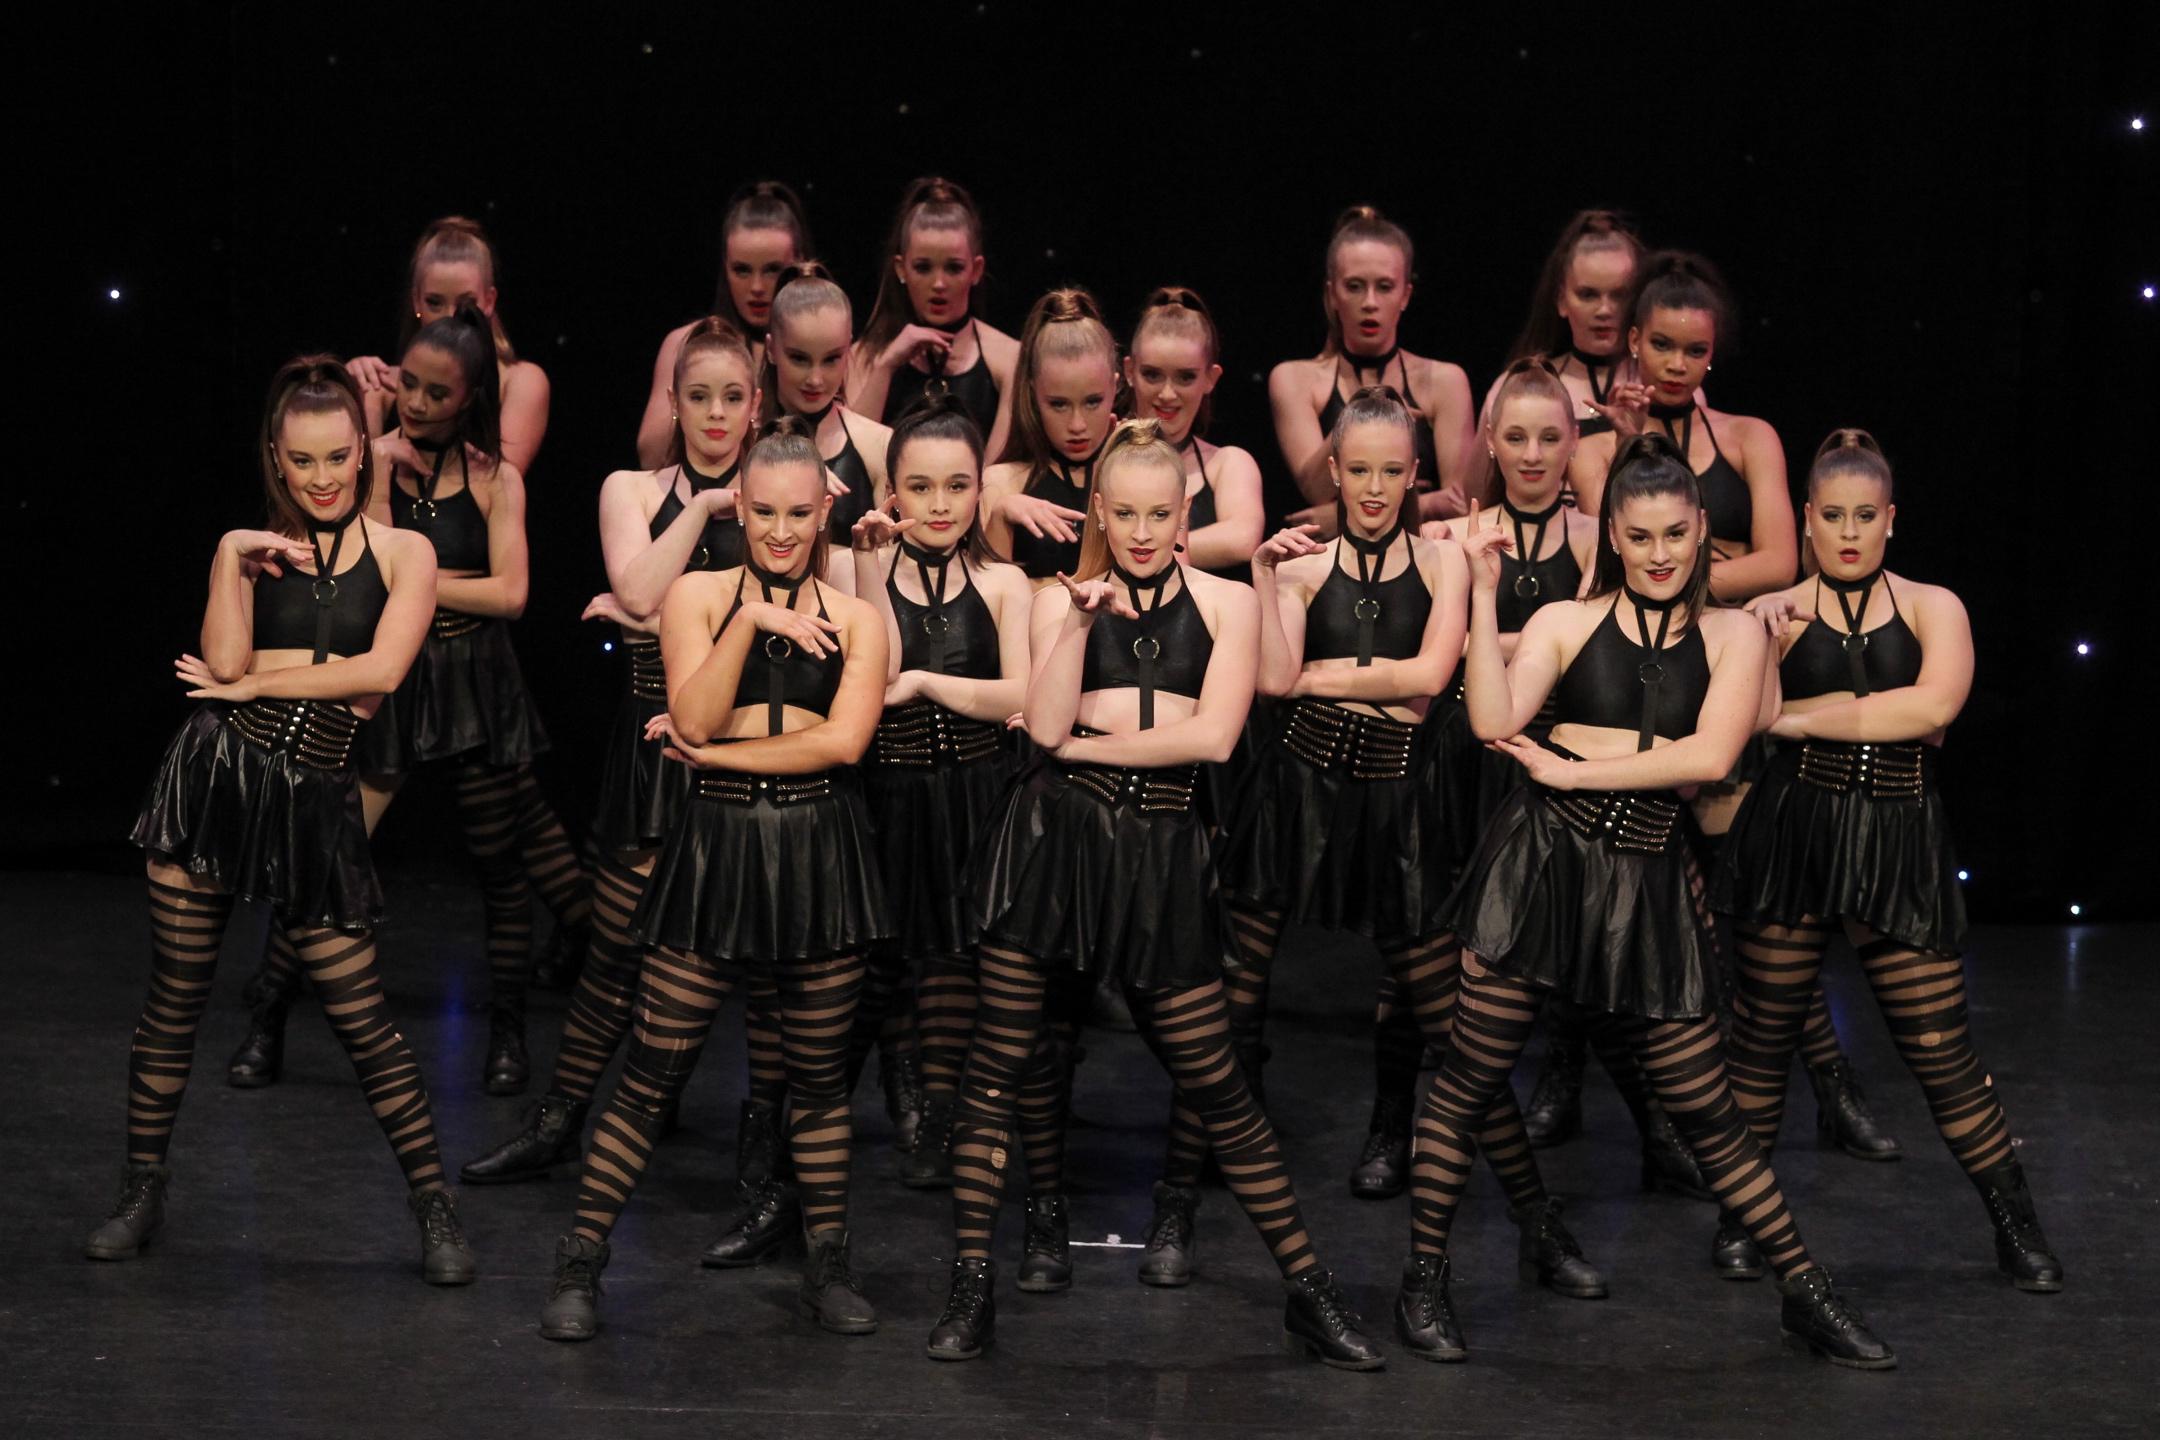 commercial jazz dance - dance teams